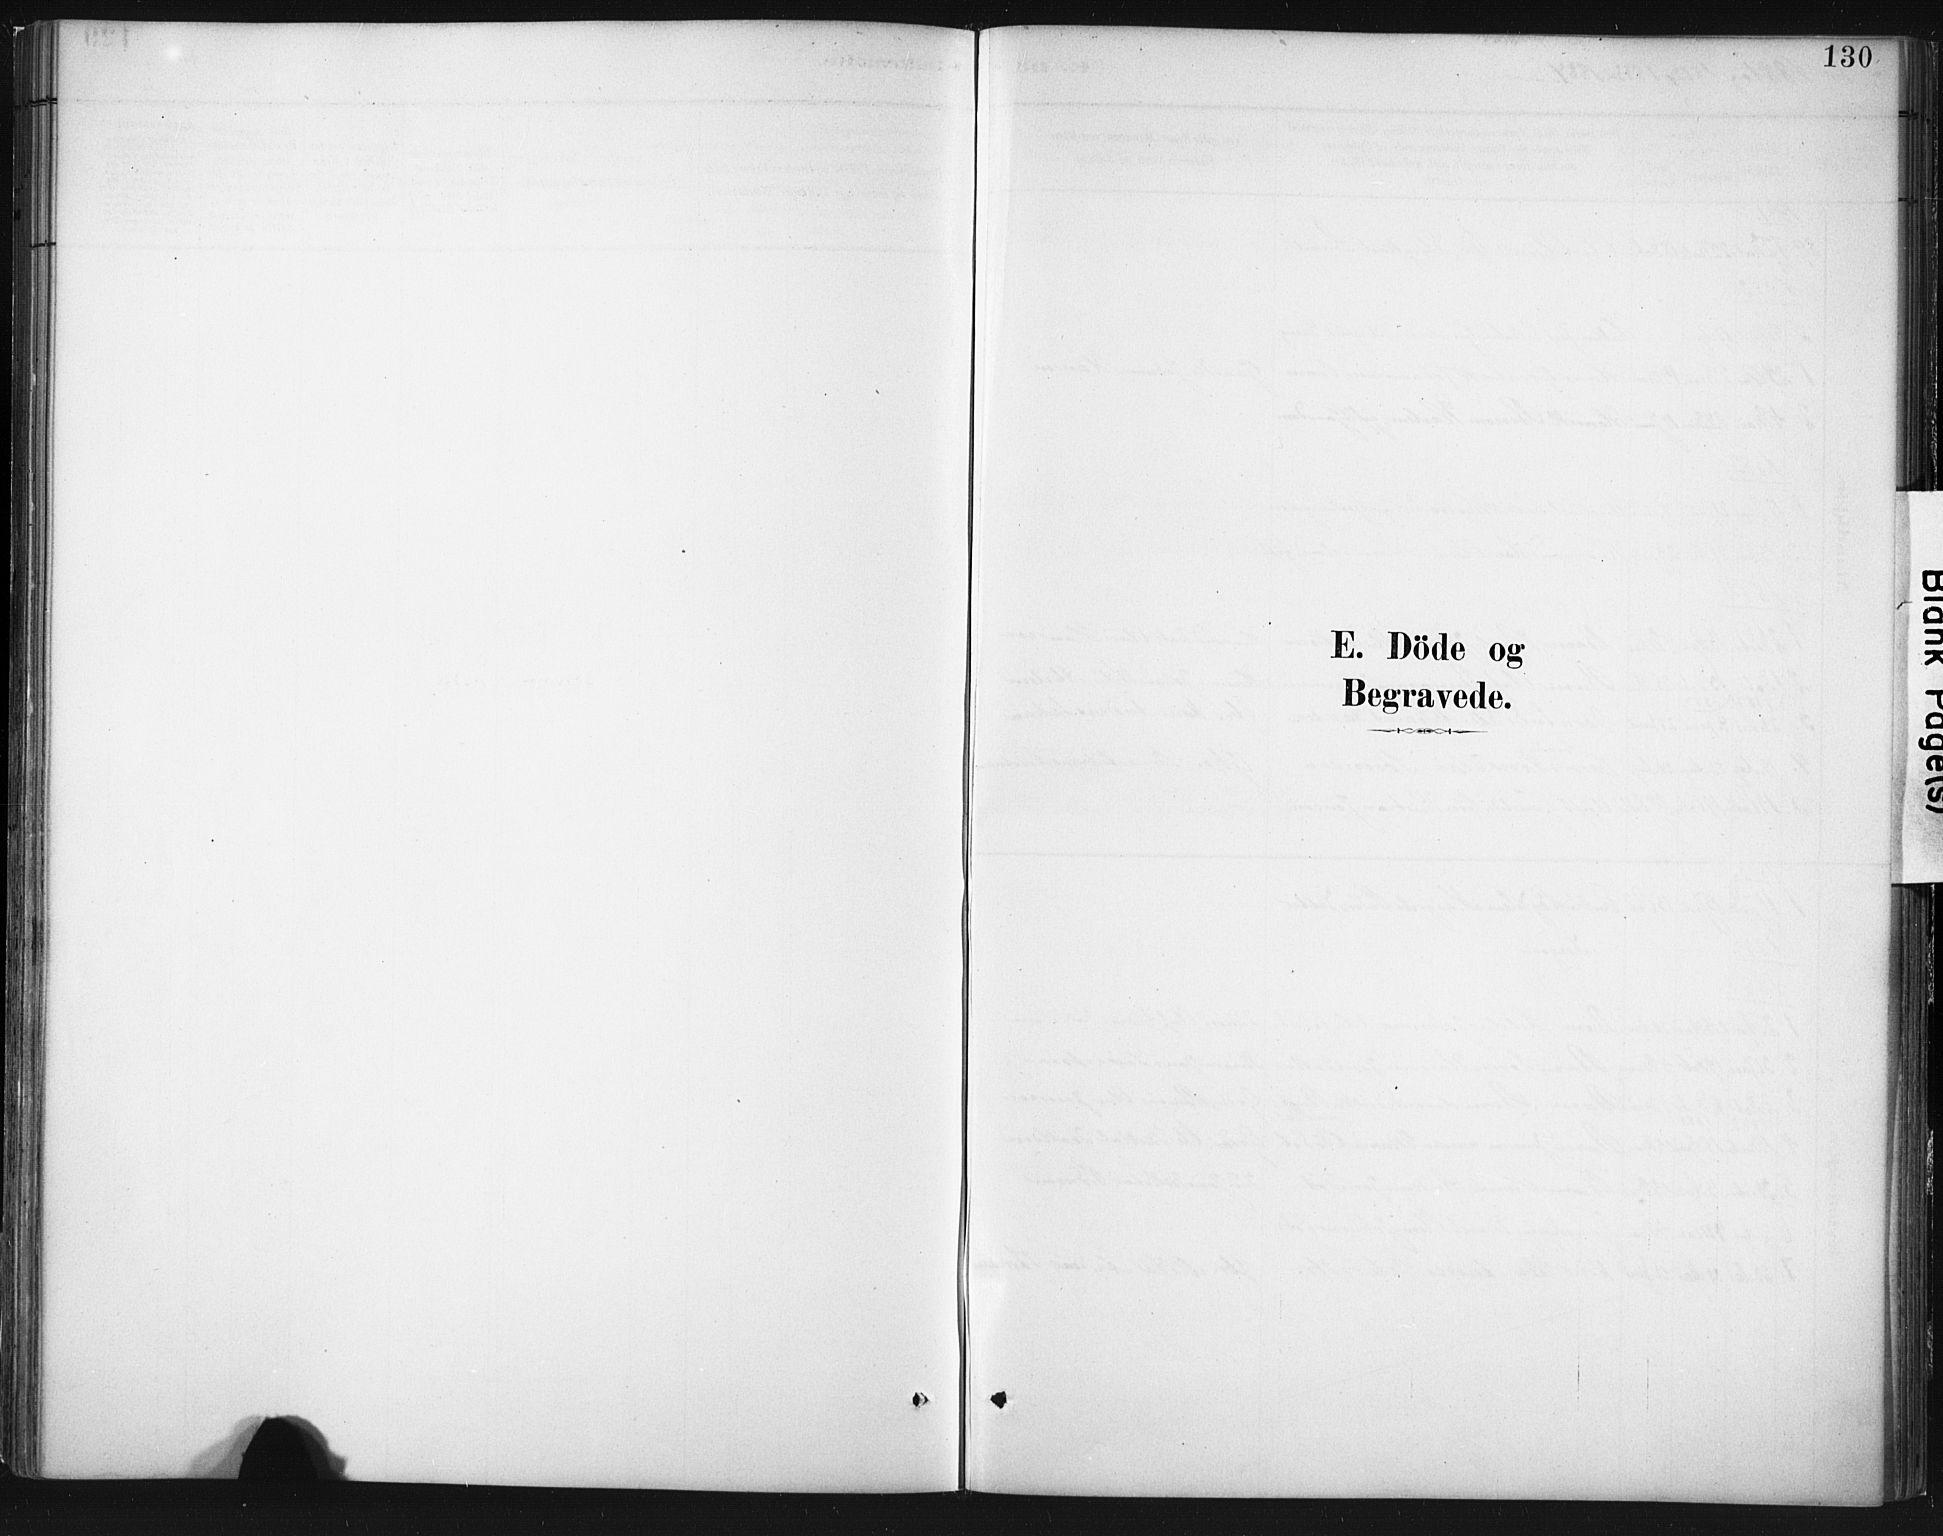 SAT, Ministerialprotokoller, klokkerbøker og fødselsregistre - Nordland, 803/L0071: Ministerialbok nr. 803A01, 1881-1897, s. 130